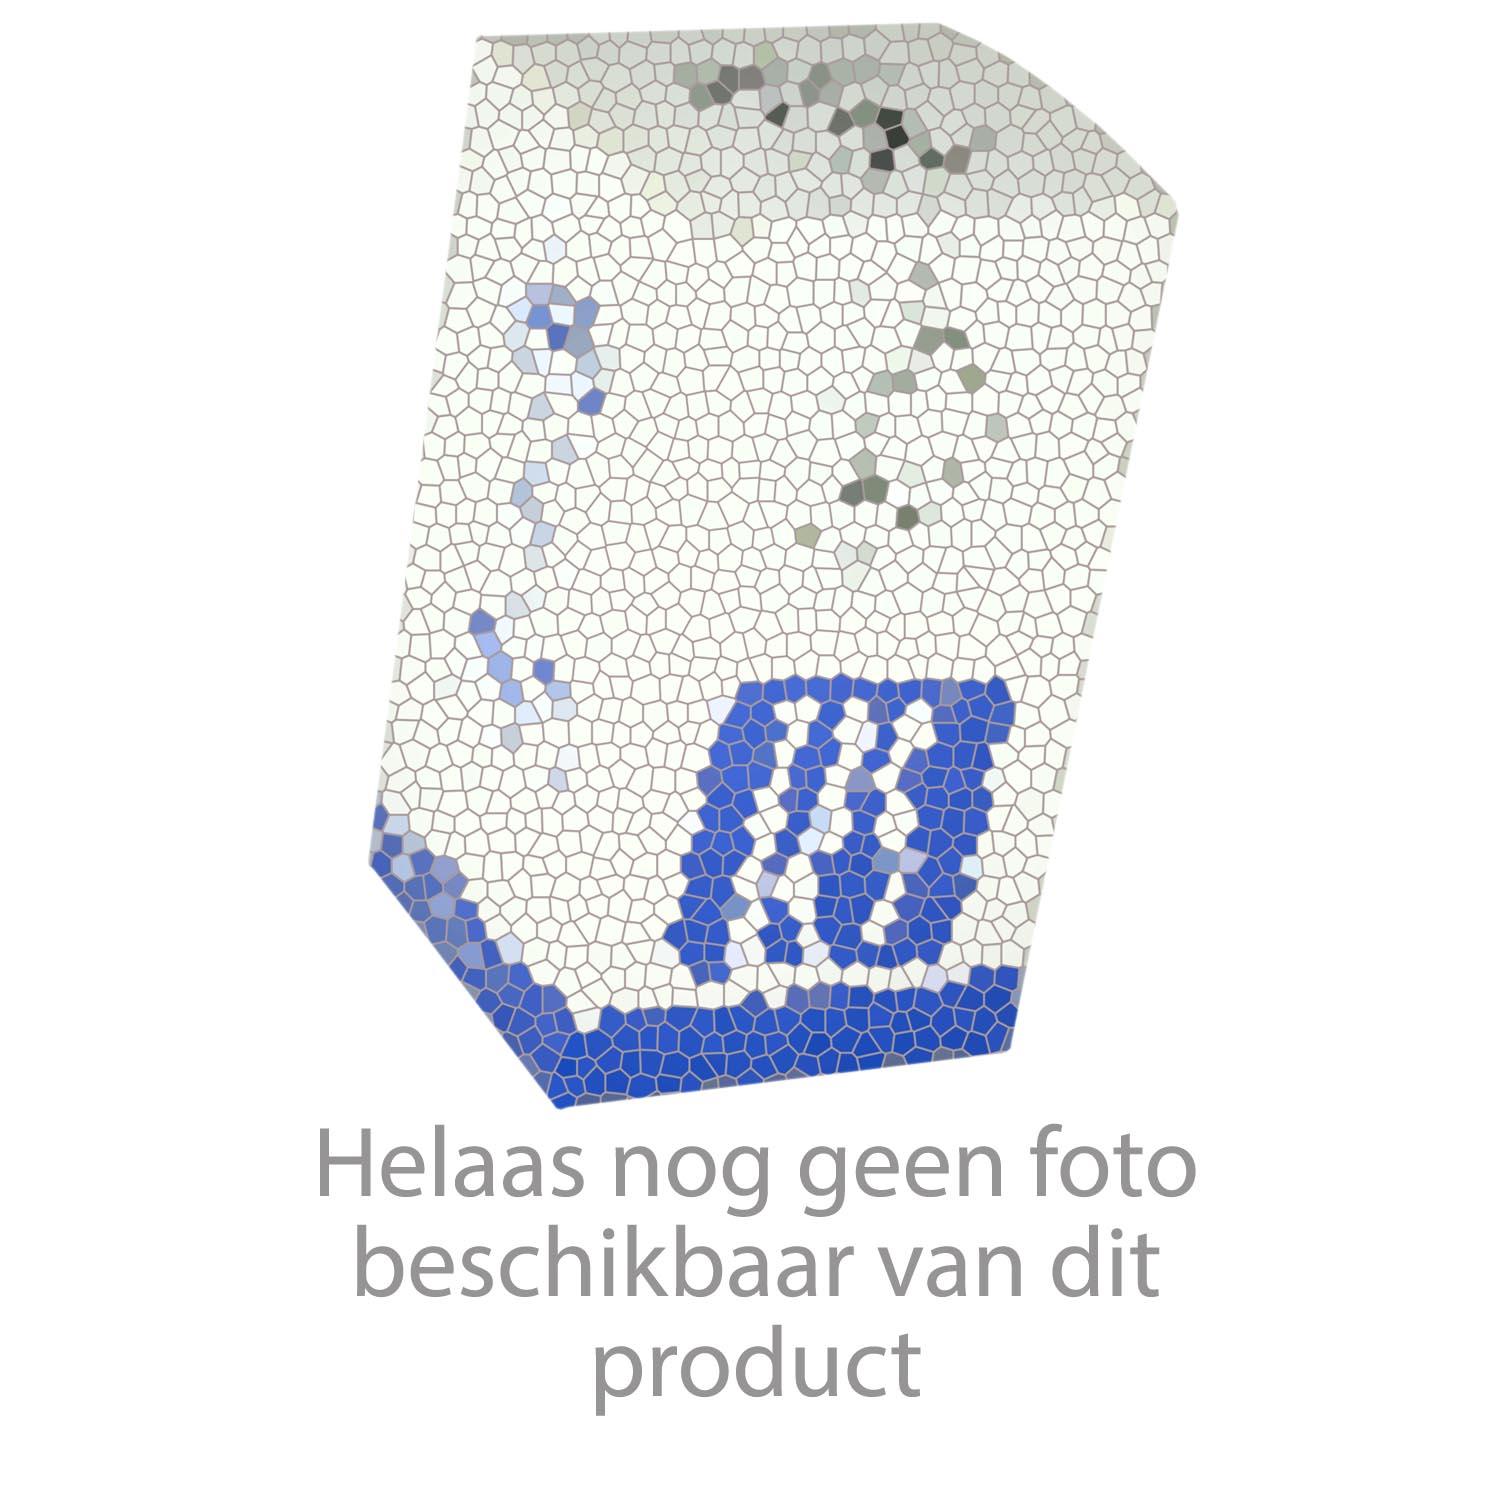 "Viega Overlooppijp gootsteenplug 6/4"" Waterstand 200mm chroom"